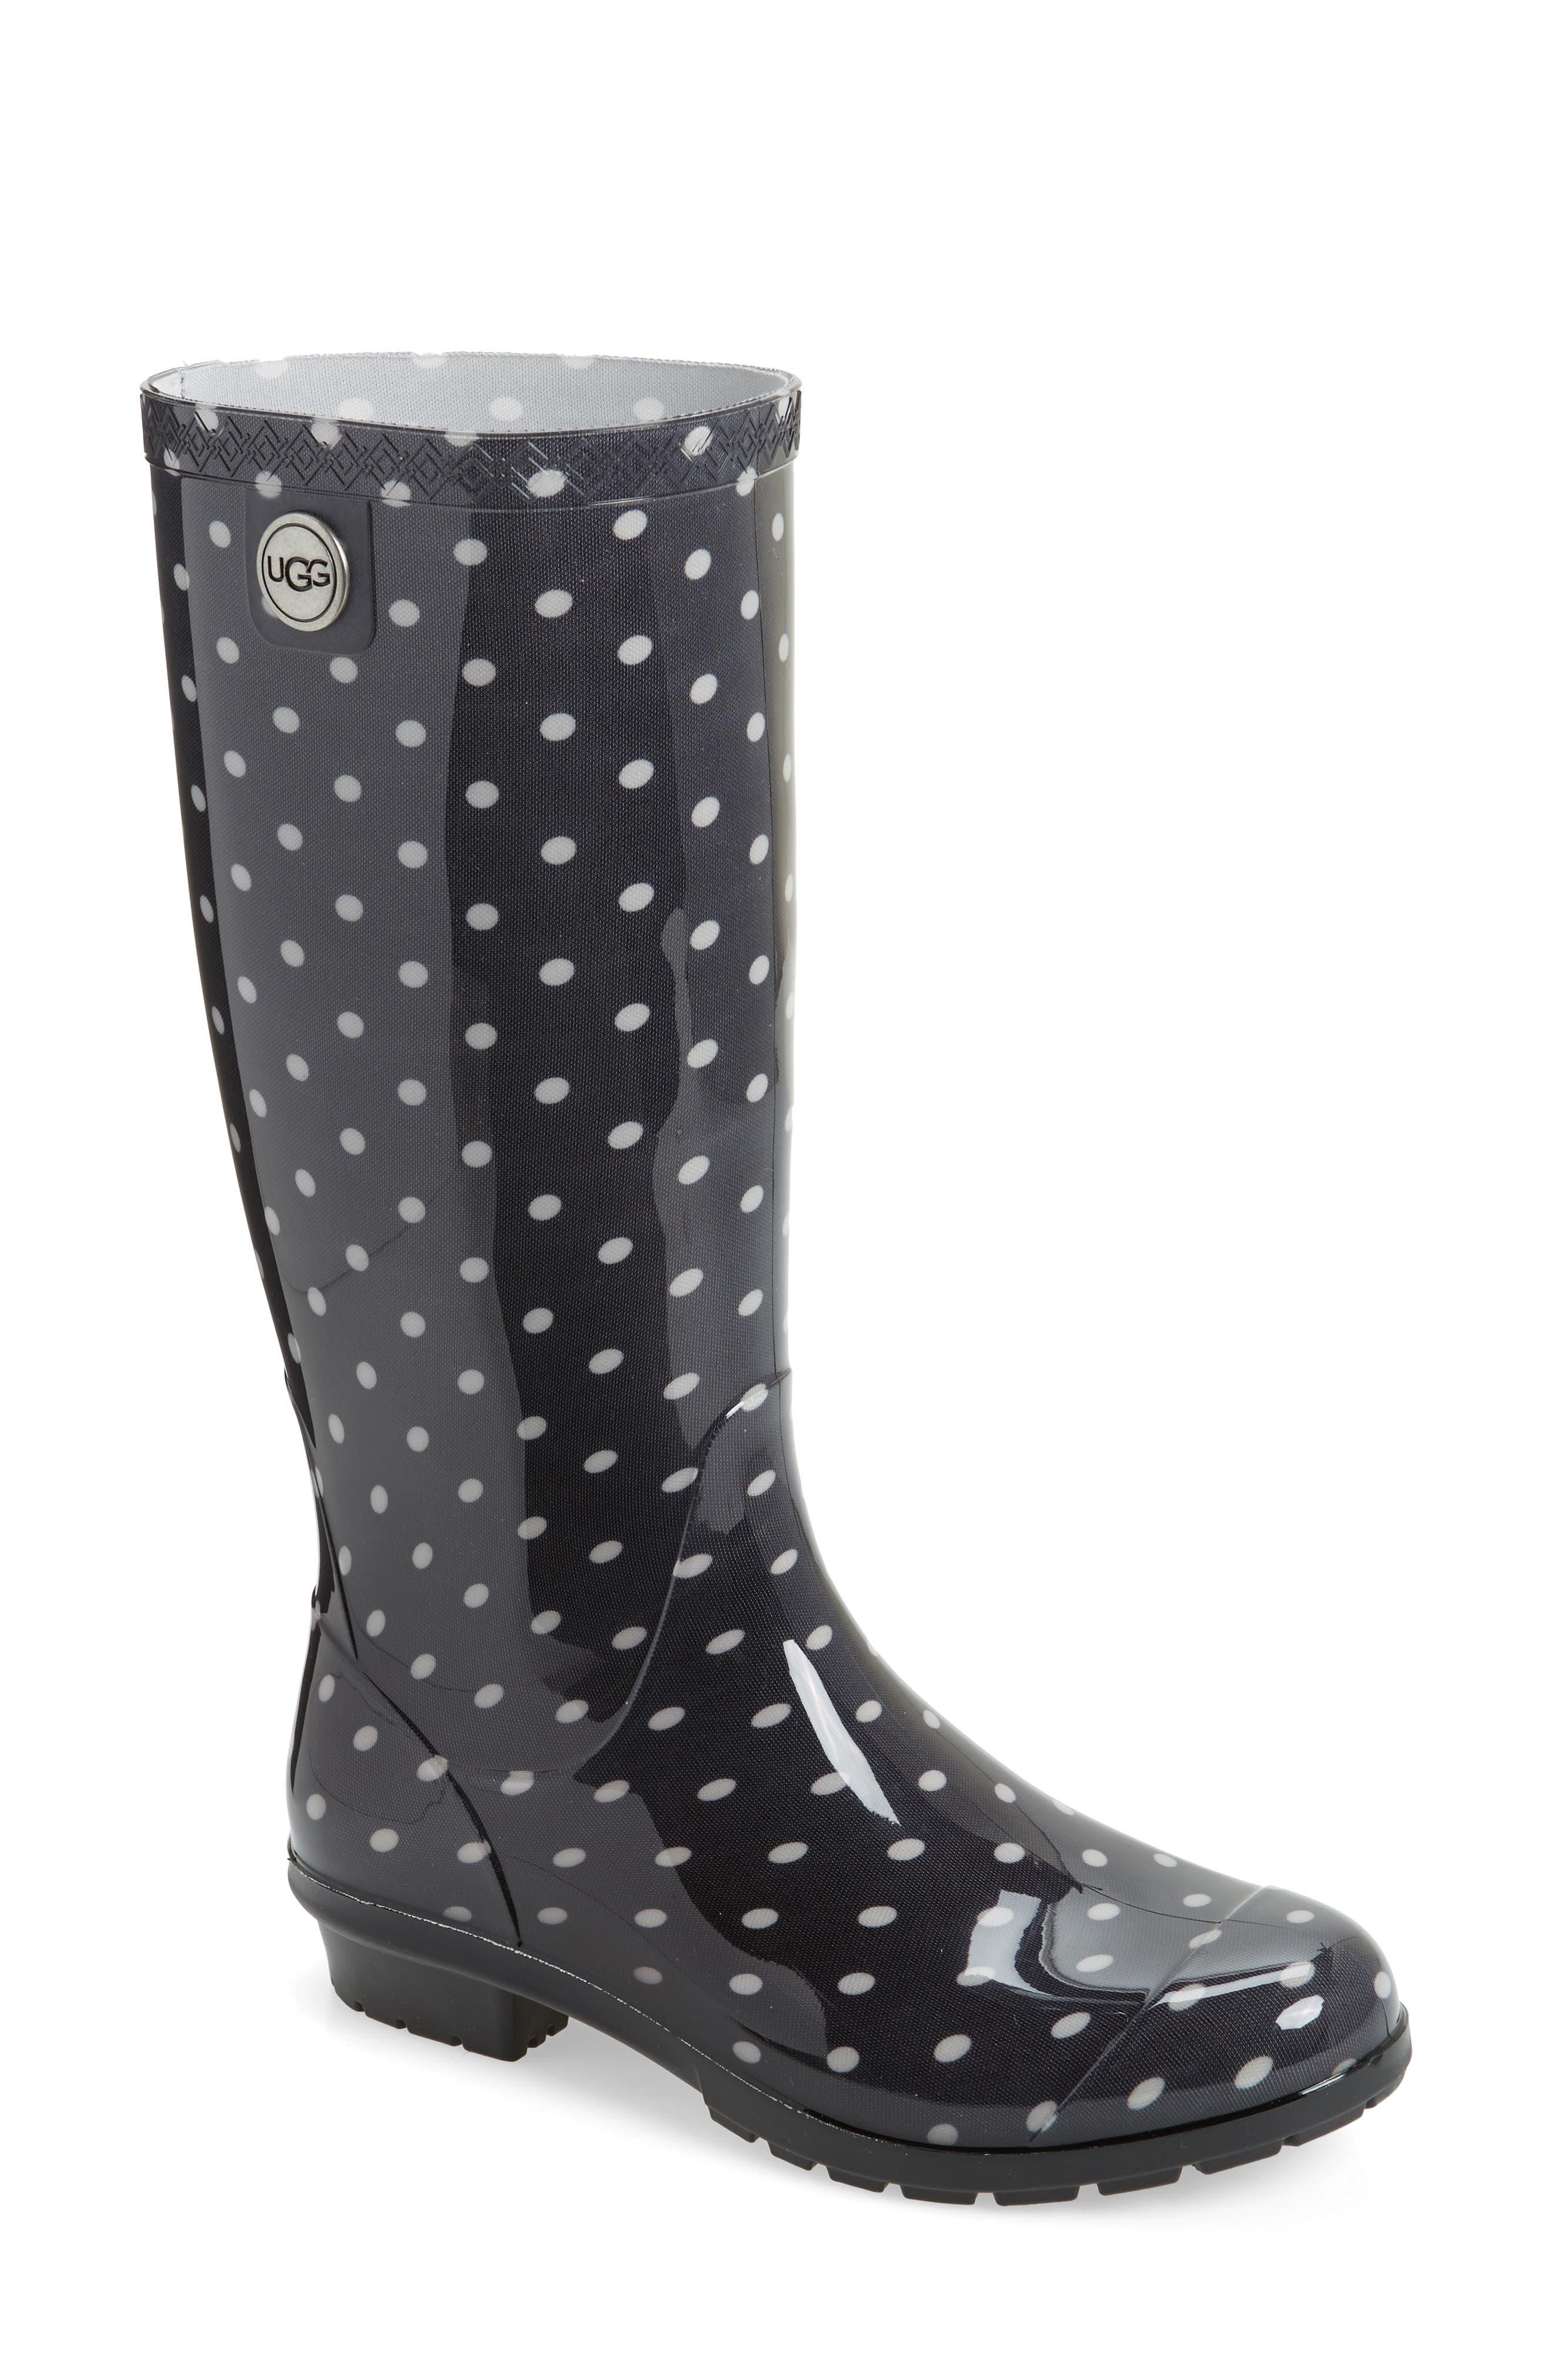 Shaye Polka Dot Rain Boot,                             Main thumbnail 1, color,                             Black/ White